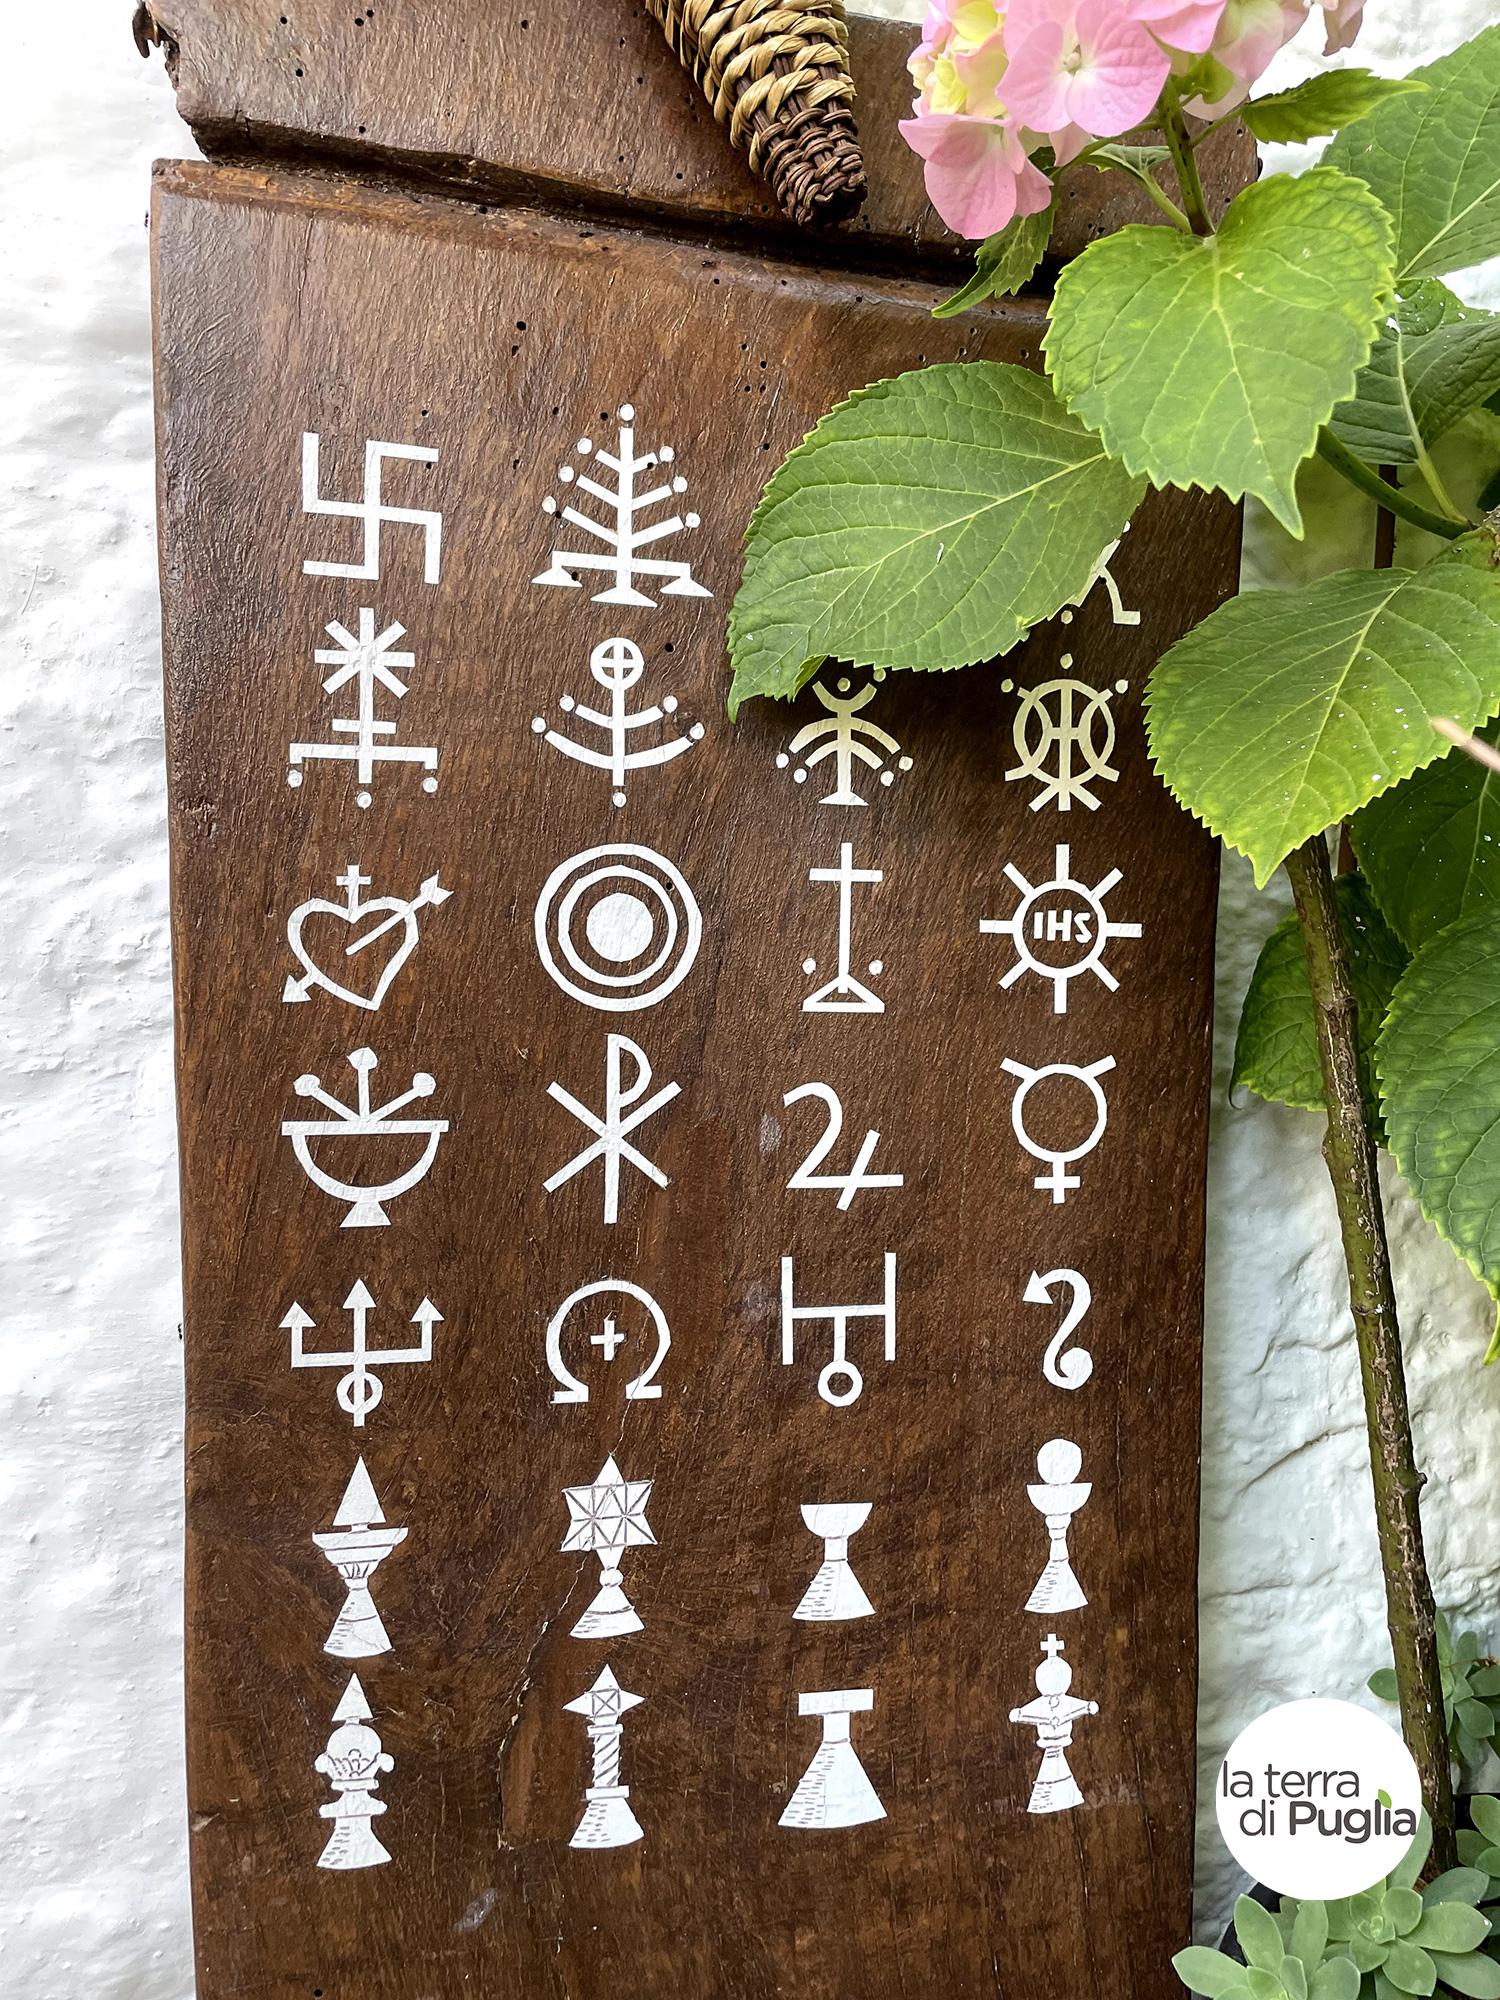 simboli-trulli-alberobello-01